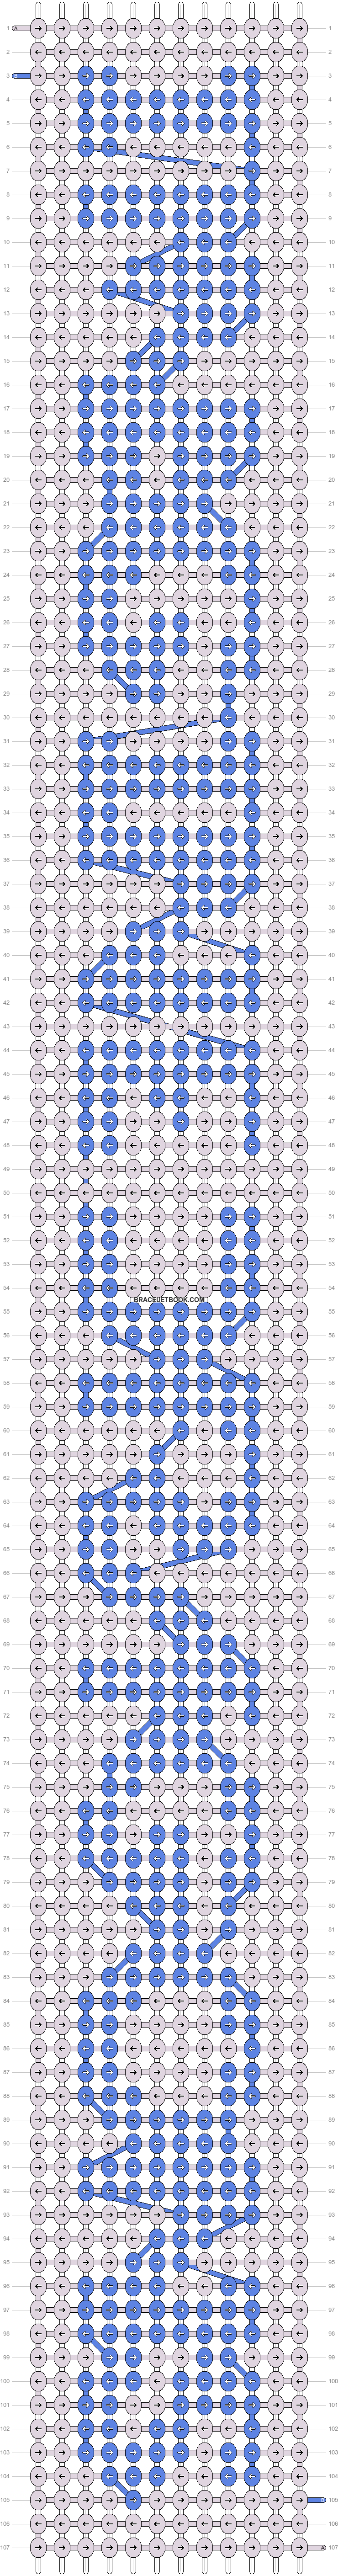 Alpha pattern #13860 pattern